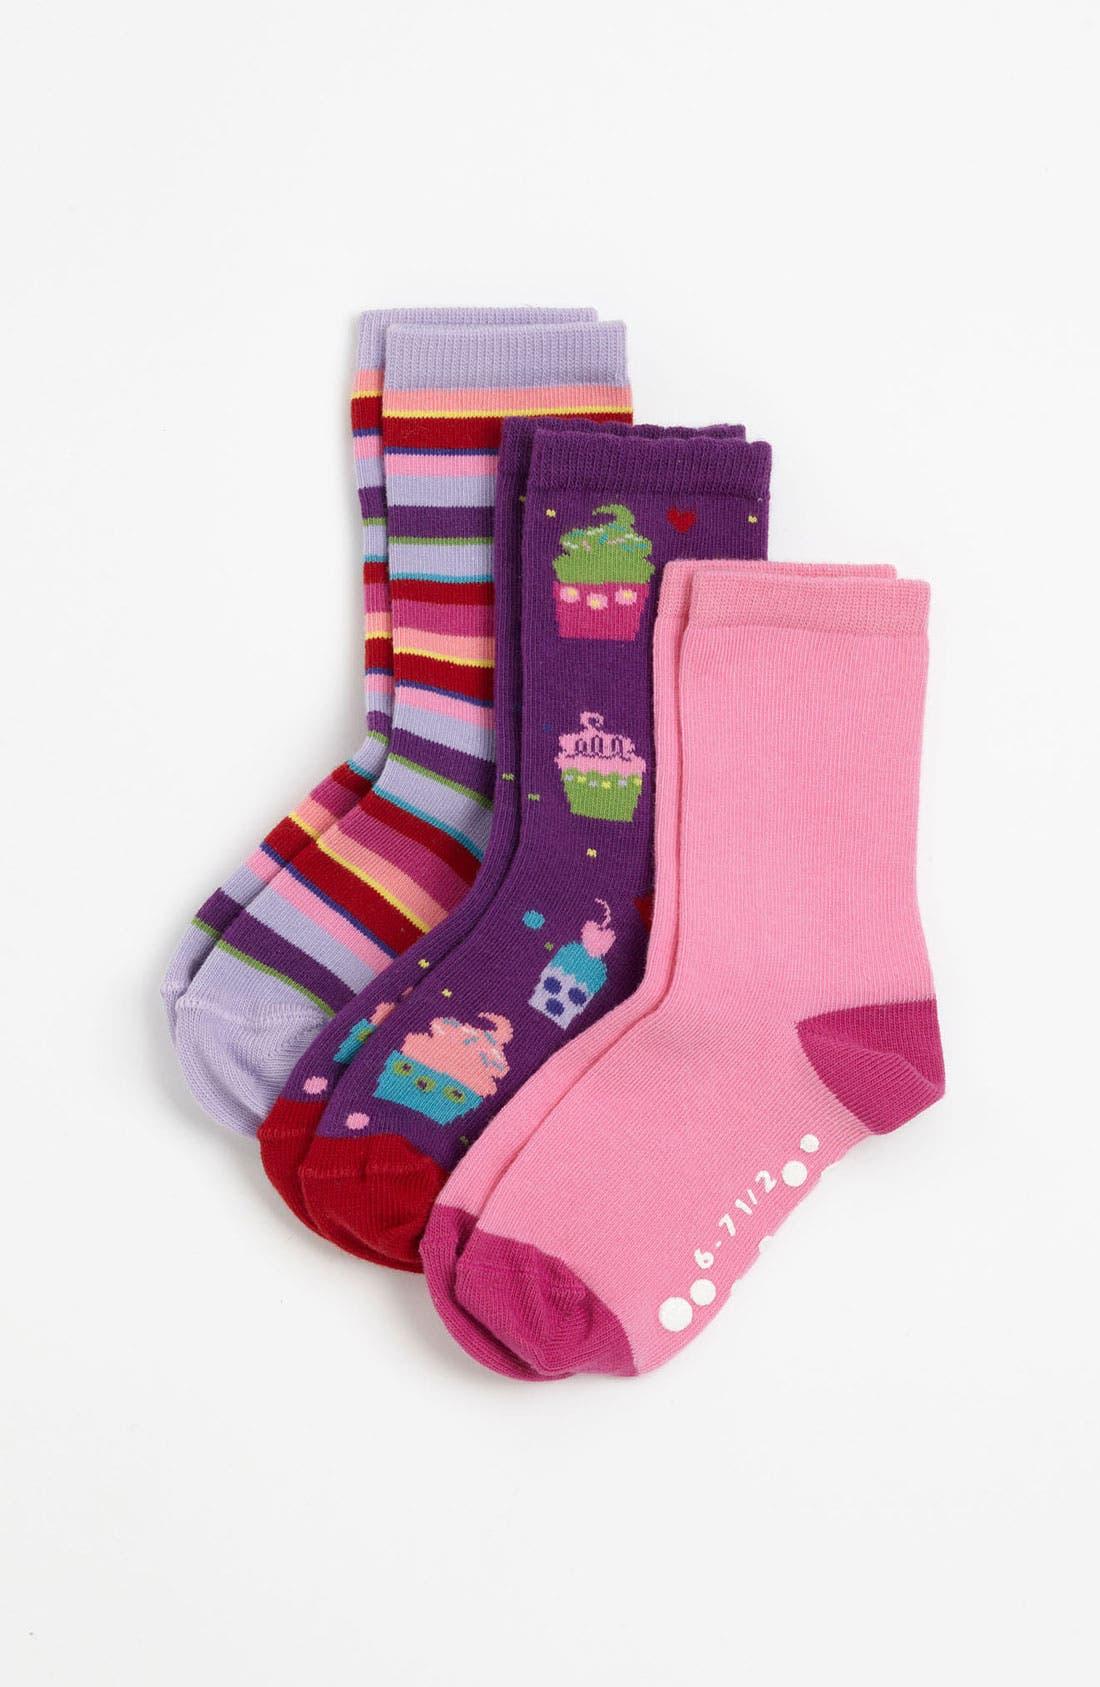 Main Image - Nordstrom 'Sweet Treats' Crew Socks (3-Pack) (Girls)